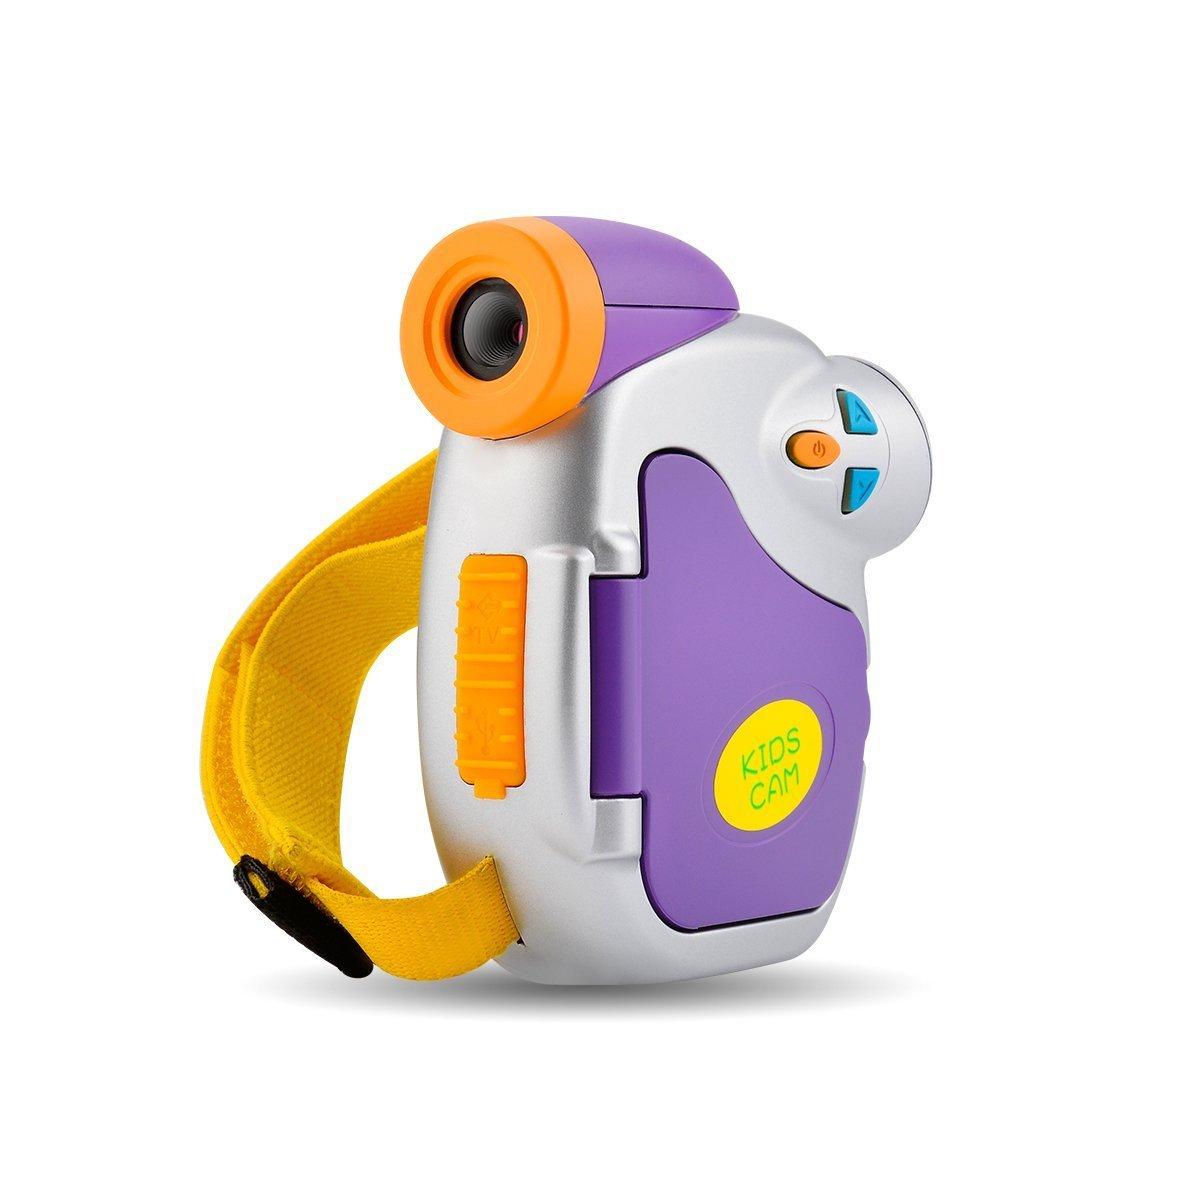 Powpro Kids Camera, Pro DVC-7CAM Kids Digital Video Camera with Ergonomic Design